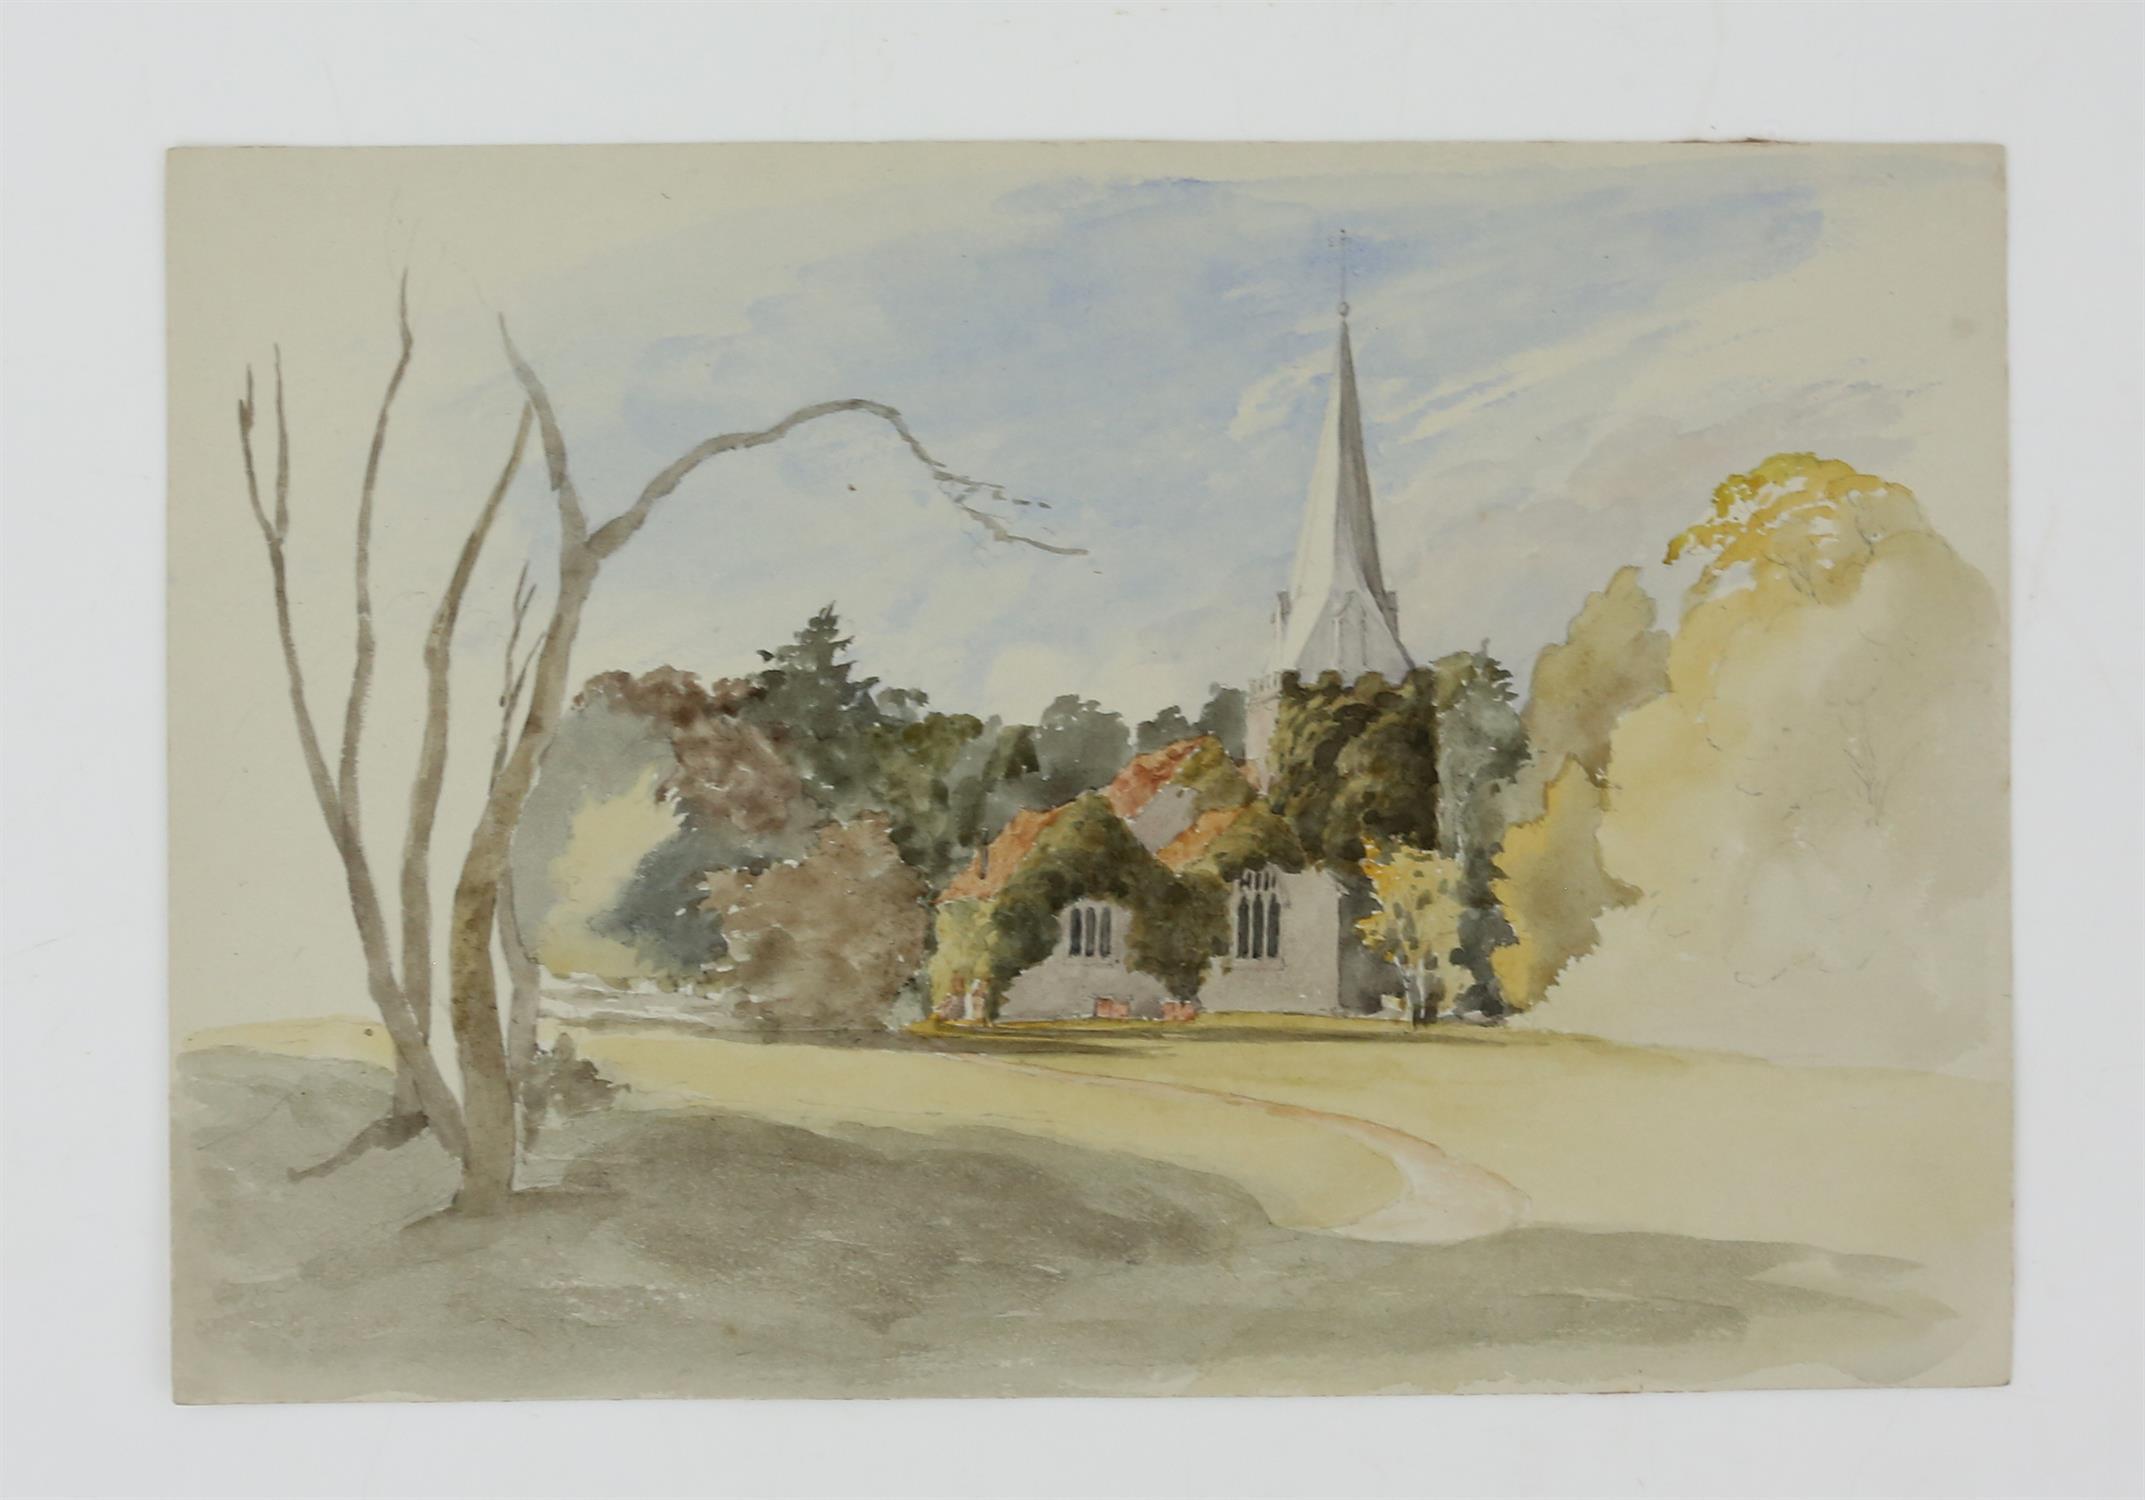 19th century British School, landscape with scene of a church, watercolour, 18cm x 26.5cm, 'St. - Image 2 of 6